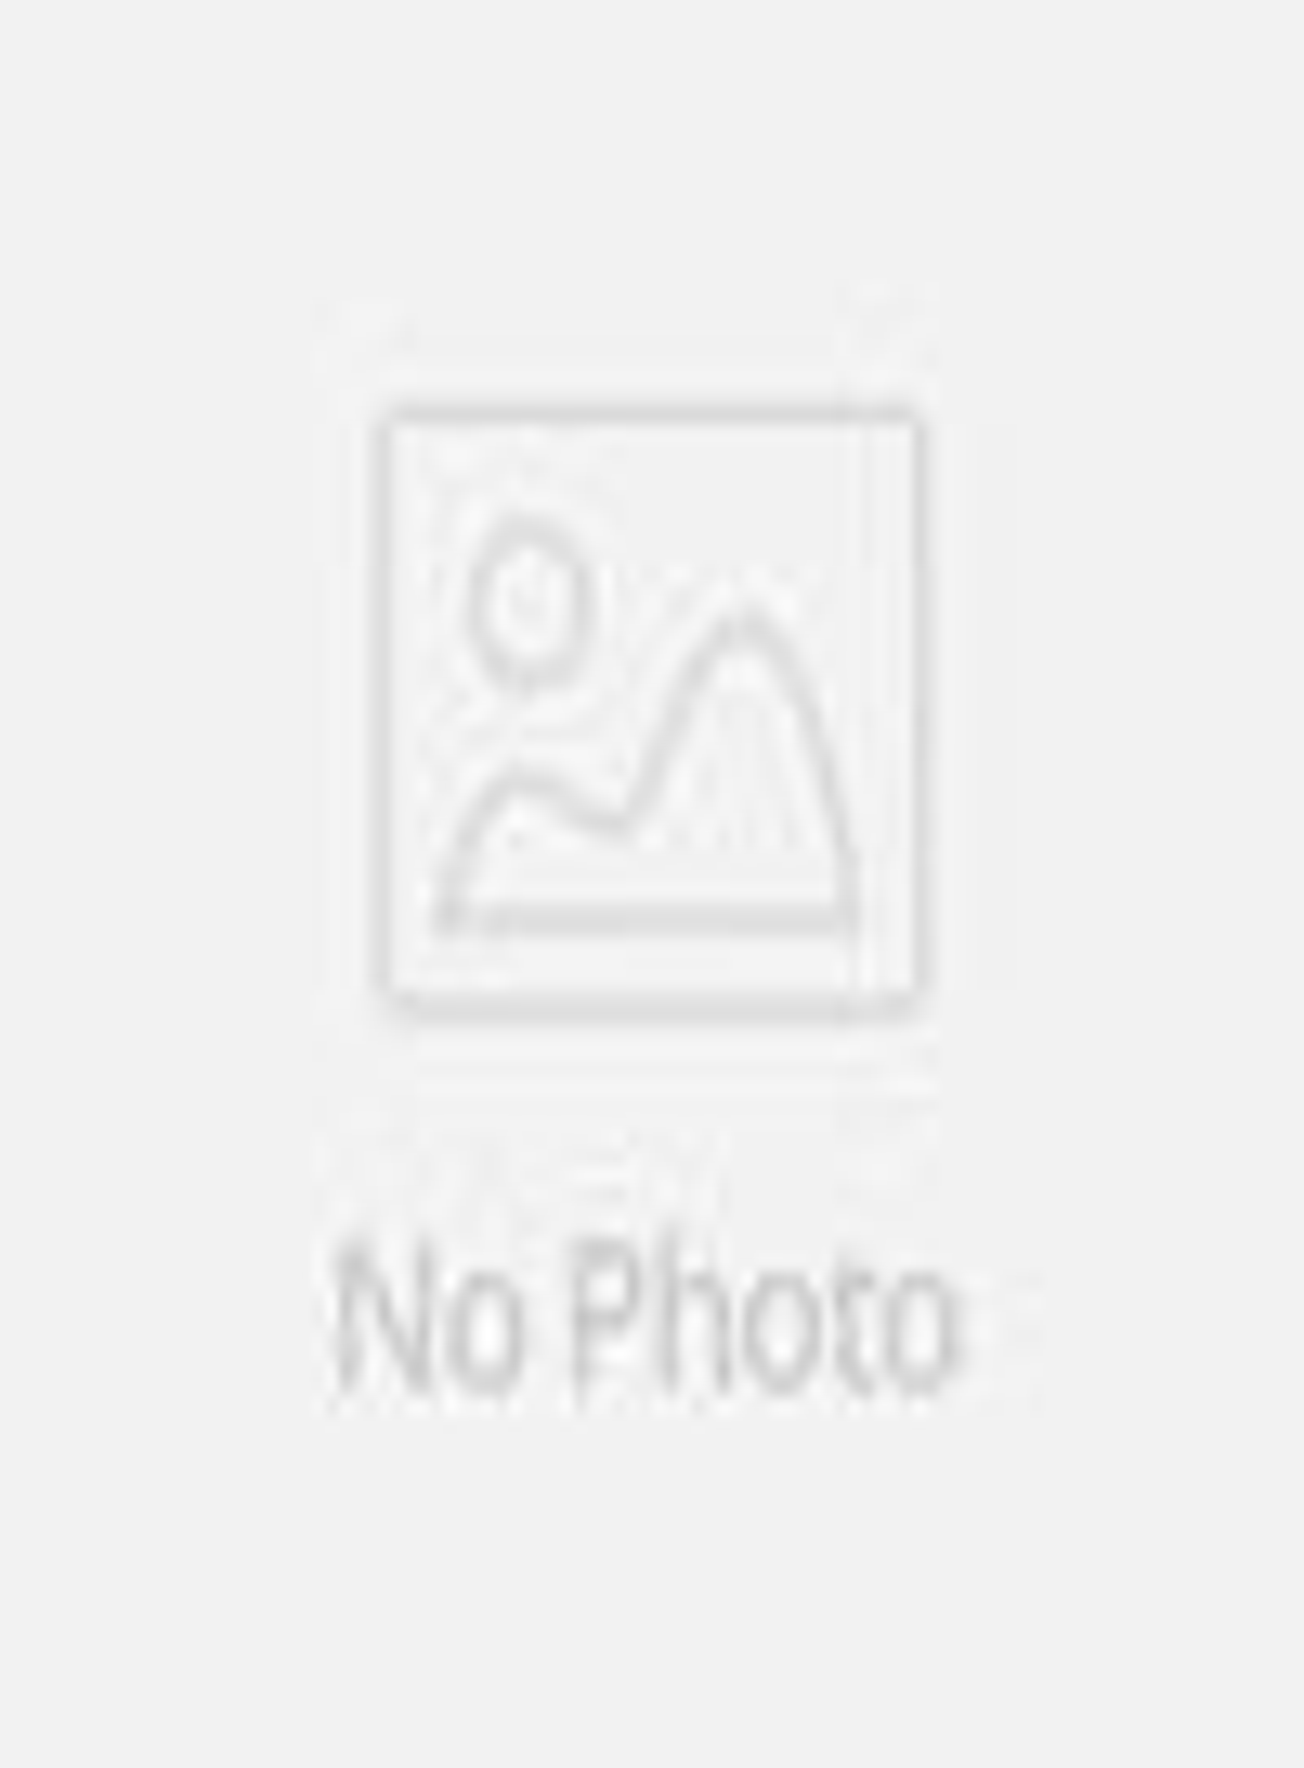 HQ2107 household bathroom toilet cleaning brush/bathroom brush